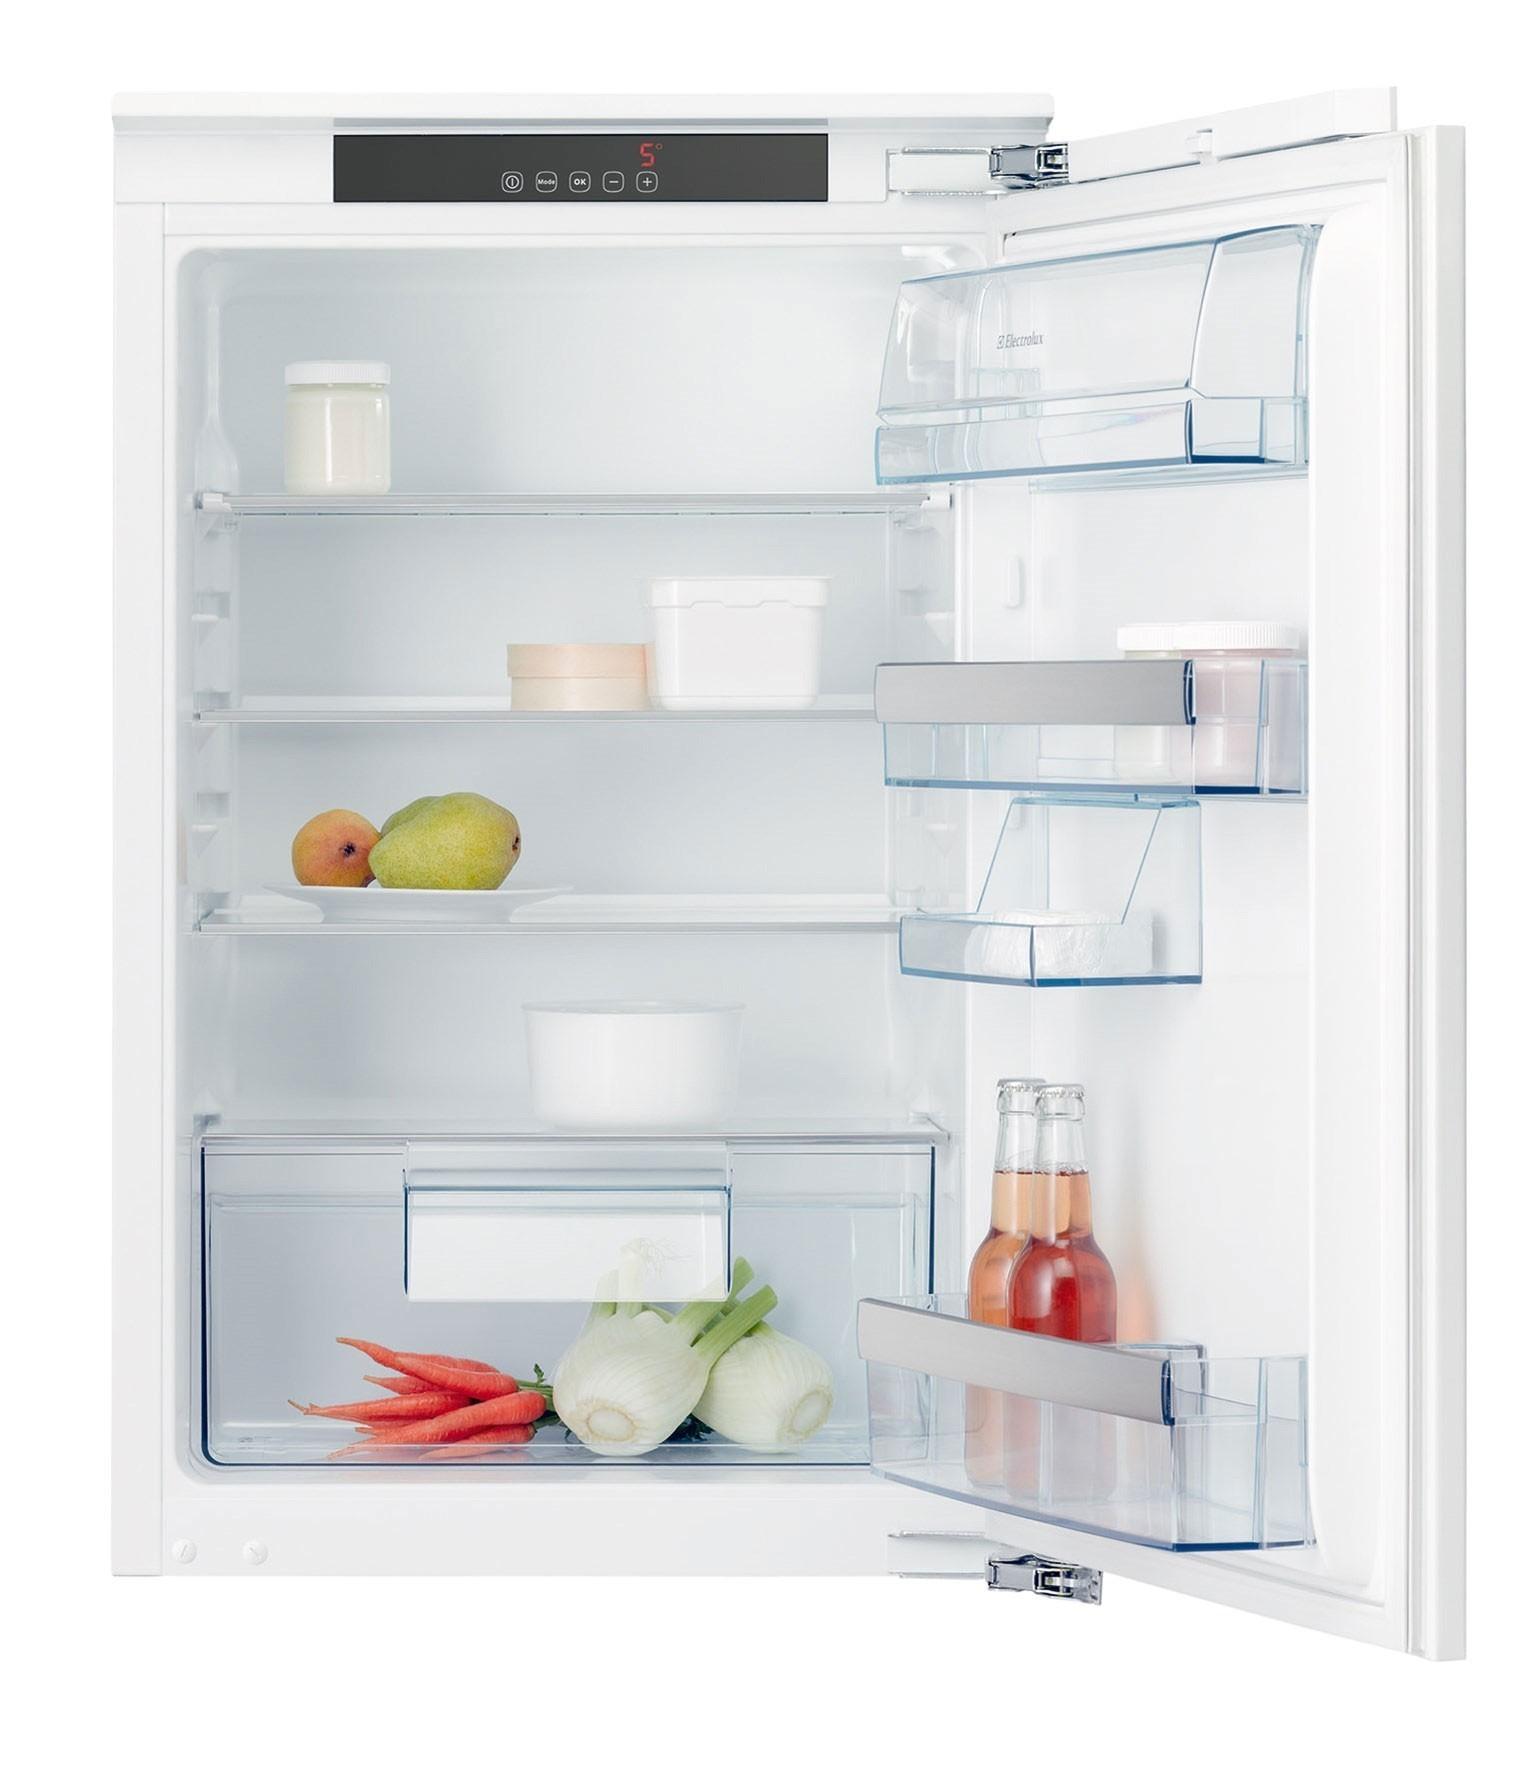 frigo encastrable electrolux amazing zanussi frigo encastrable zbasa with frigo encastrable. Black Bedroom Furniture Sets. Home Design Ideas